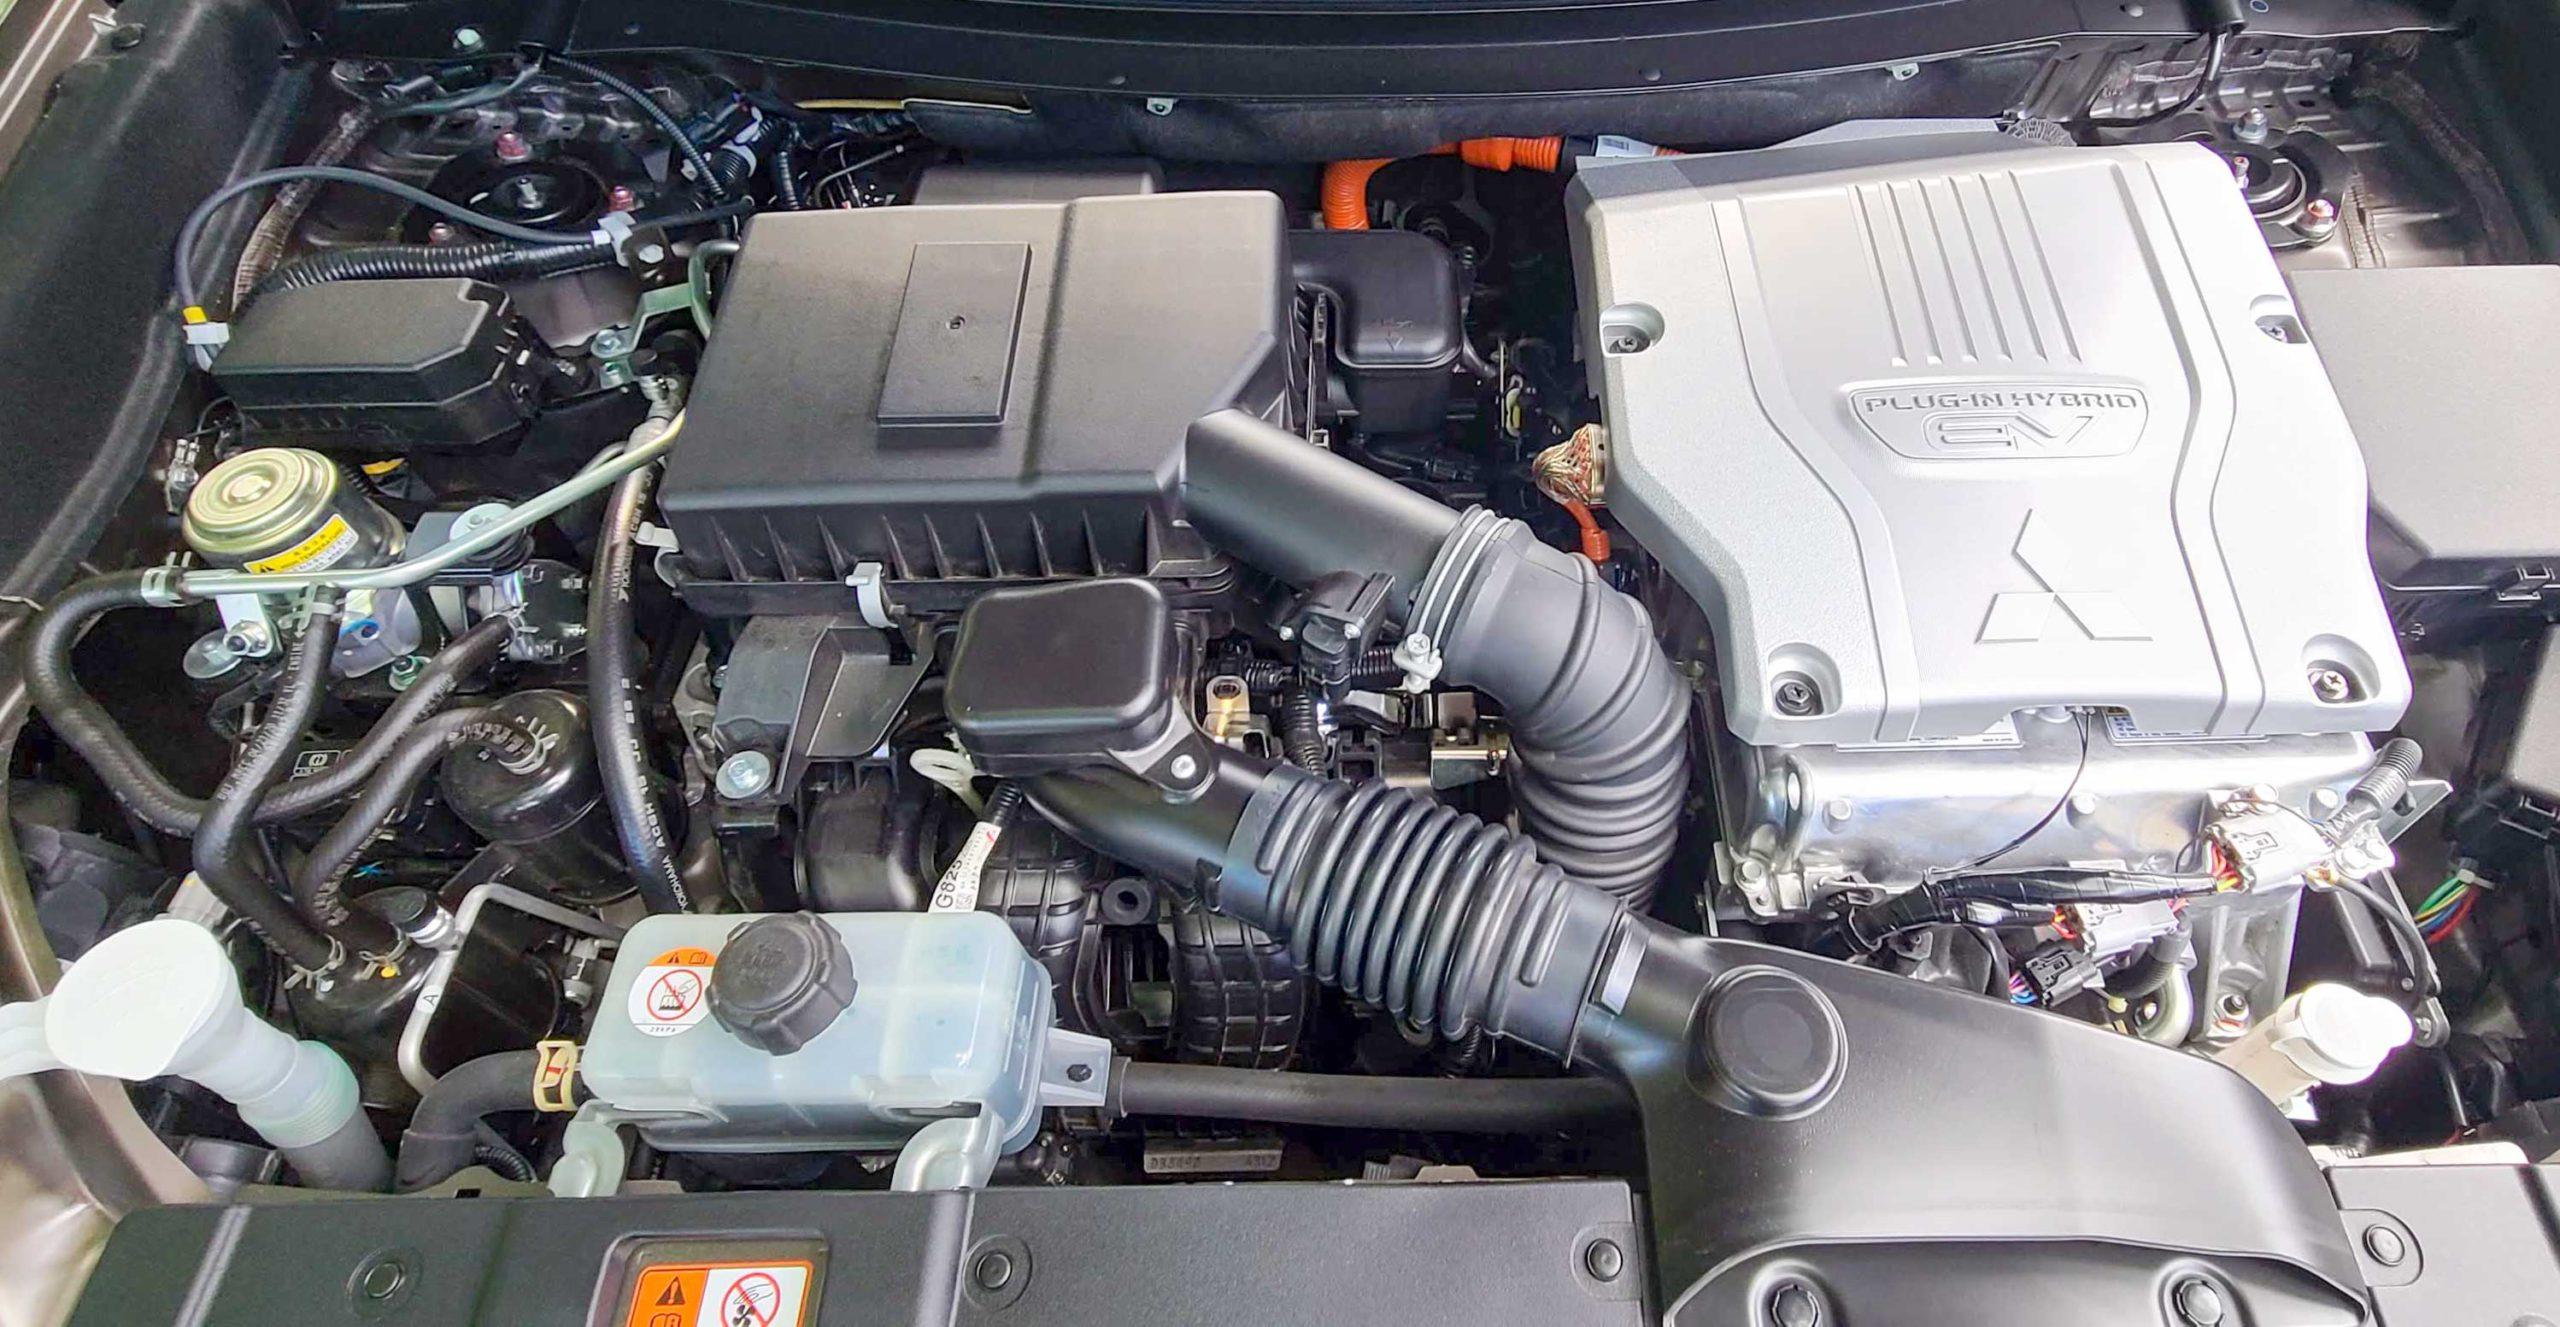 2021 Mitsubishi Outlander PHEV engine with 2.4-liter mill